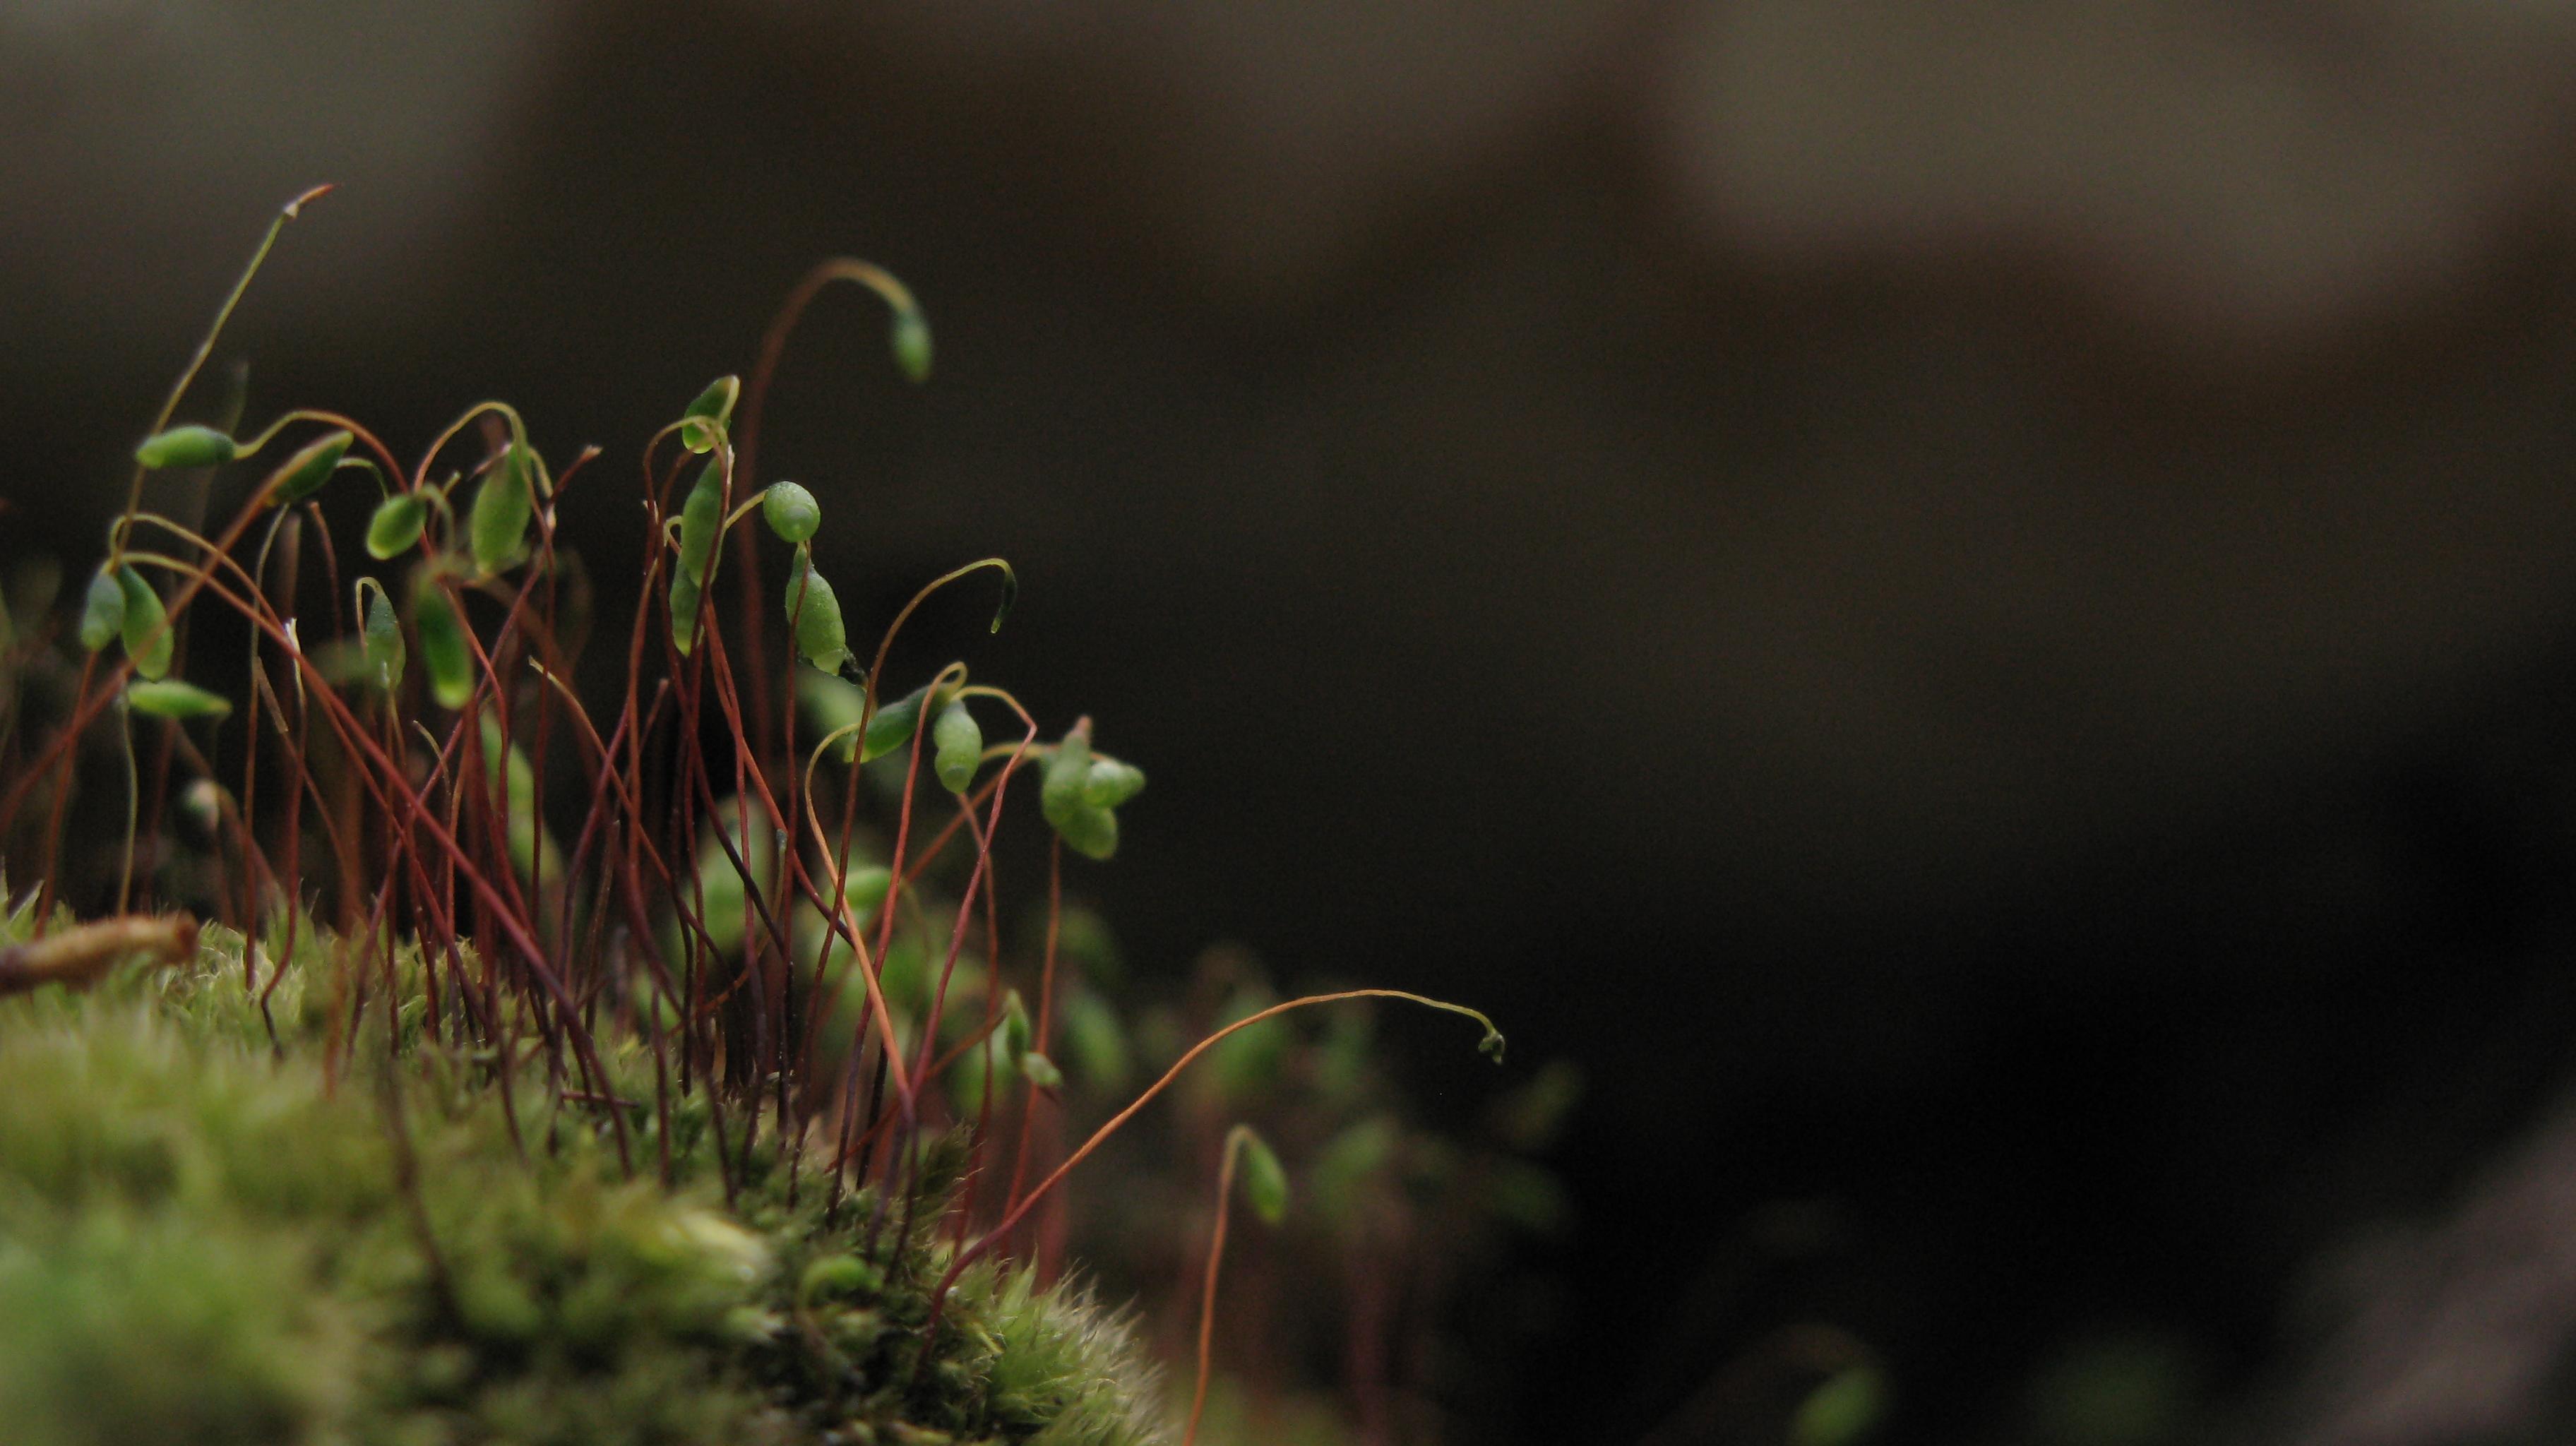 Fragile vegetation growing on moss